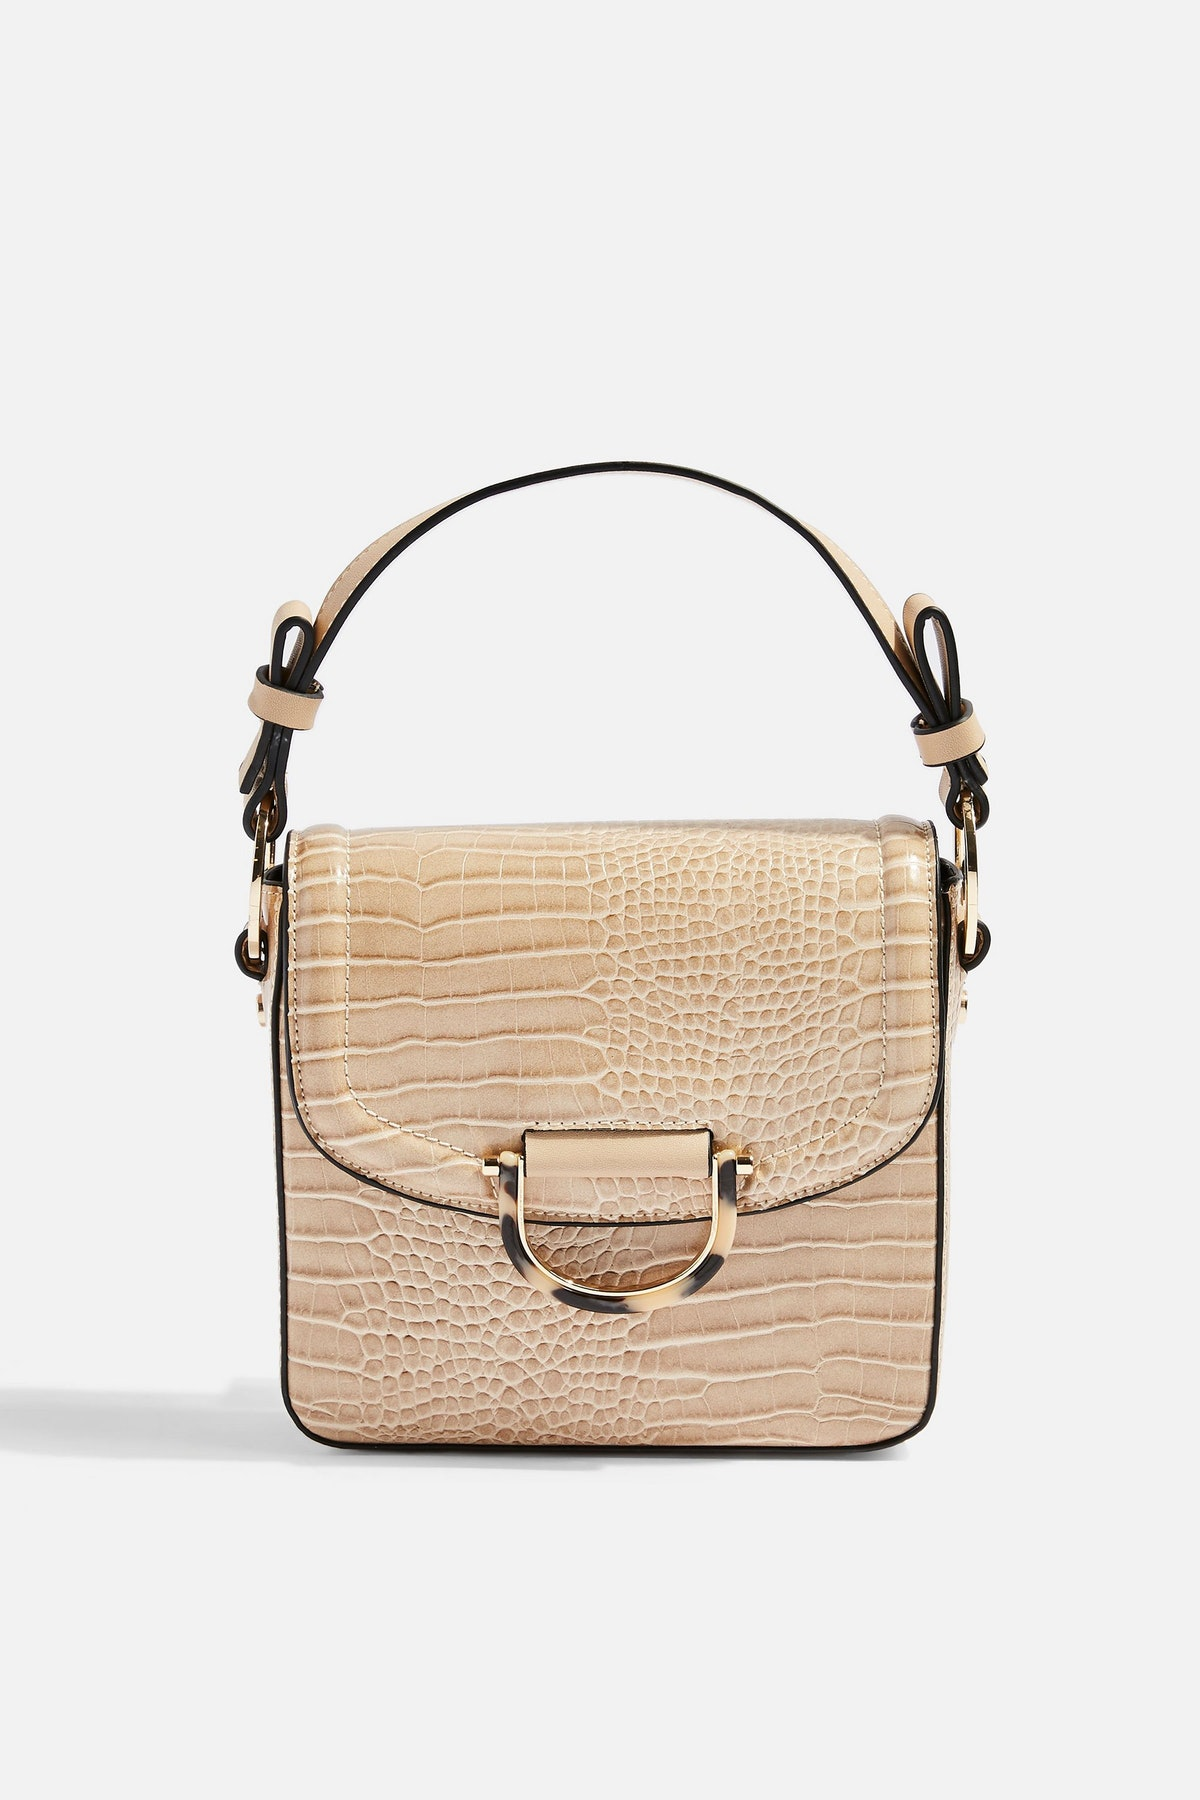 CARRIE Stone Crocodile Shoulder Bag